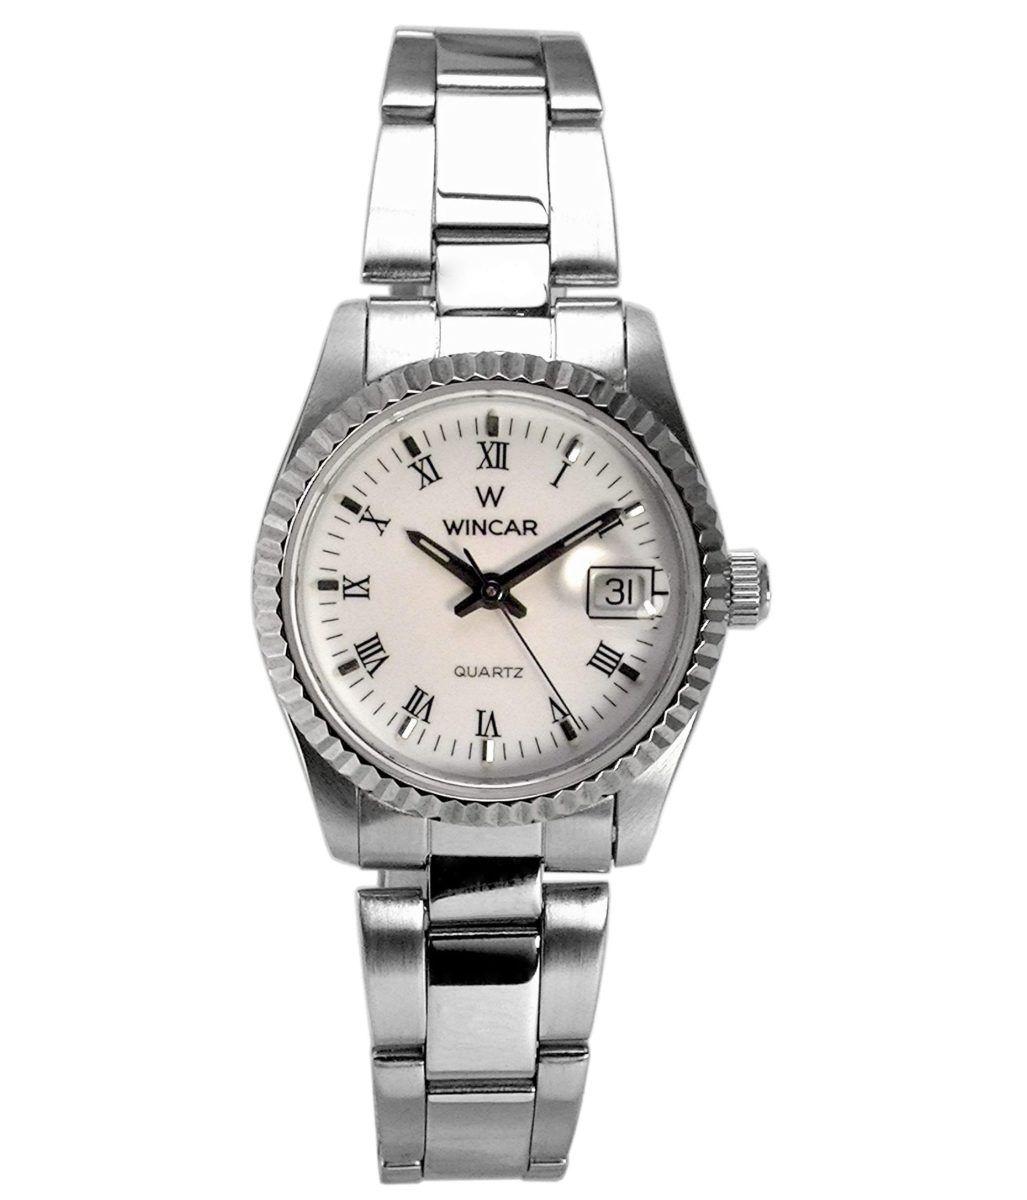 WINCAR Veronica   Life is just wonderfull!  -   #Wincar #Donna #uomo #orologio #orologi #watch #watches #lovers #coppia #man #woman